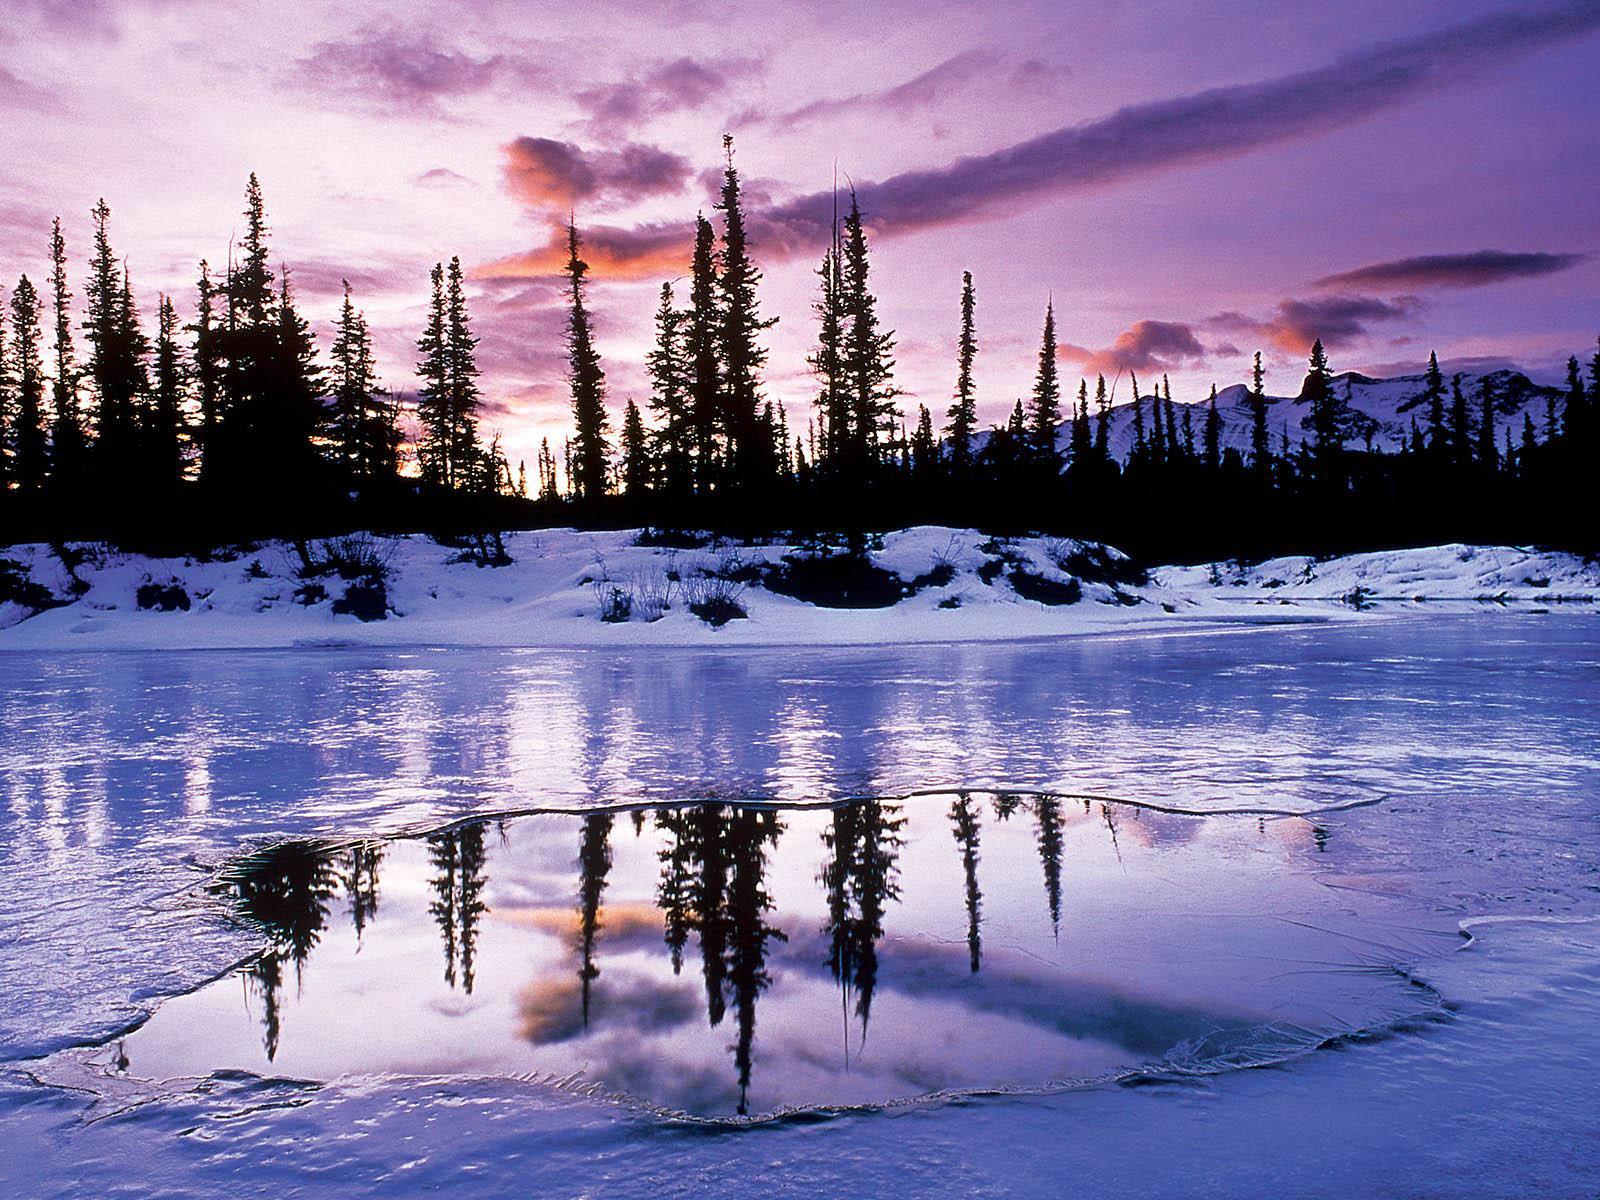 Winter Desktop Wallpapers and Backgroundswallpapers screensavers 1600x1200